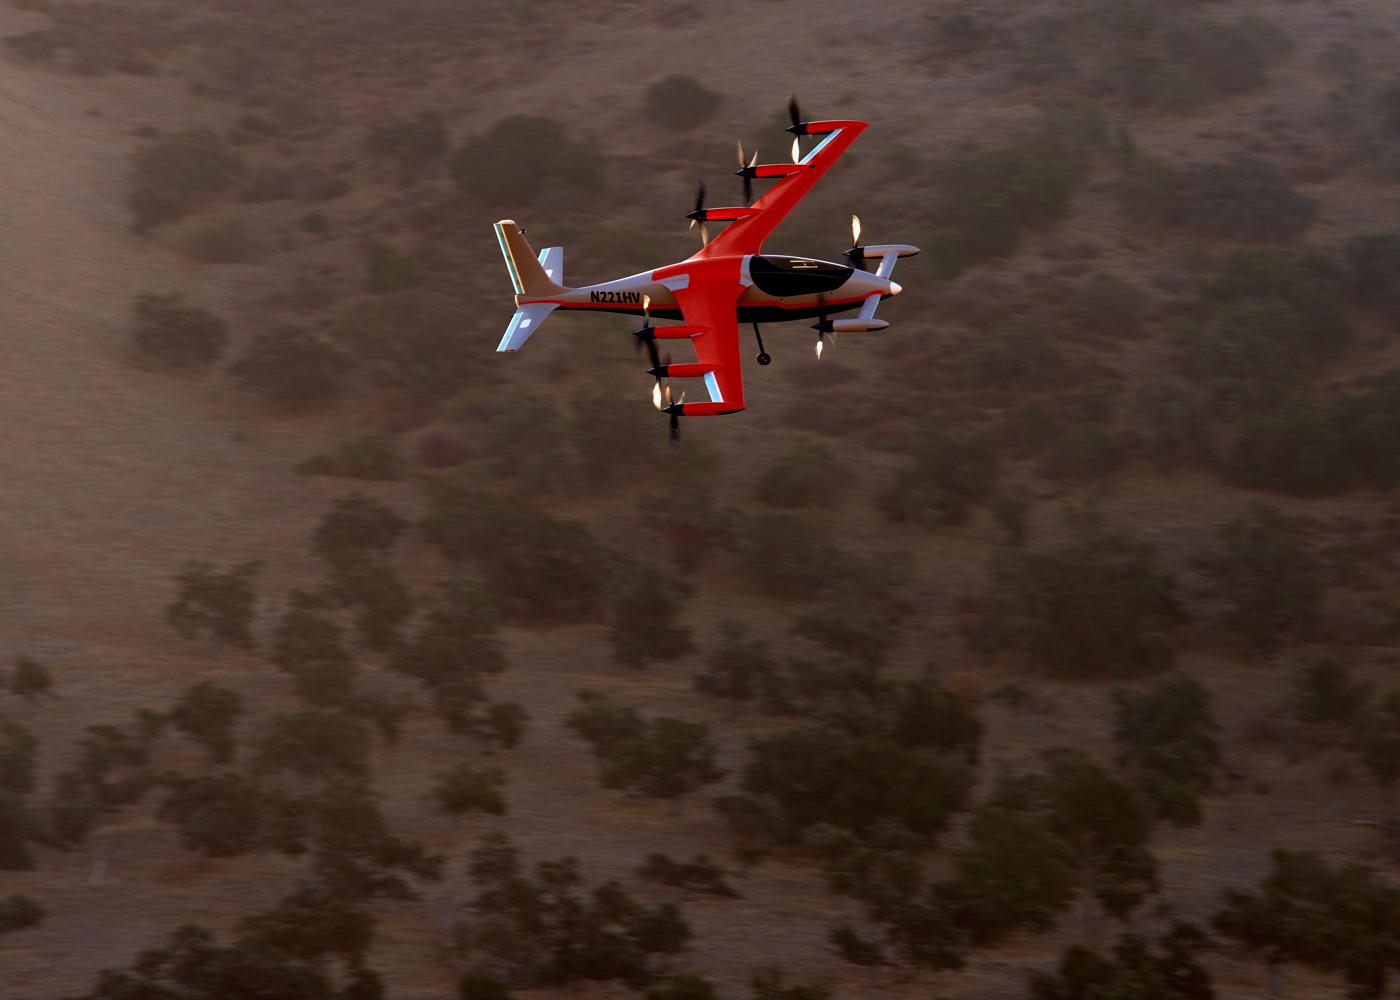 Kitty Hawk Heaviside - safety